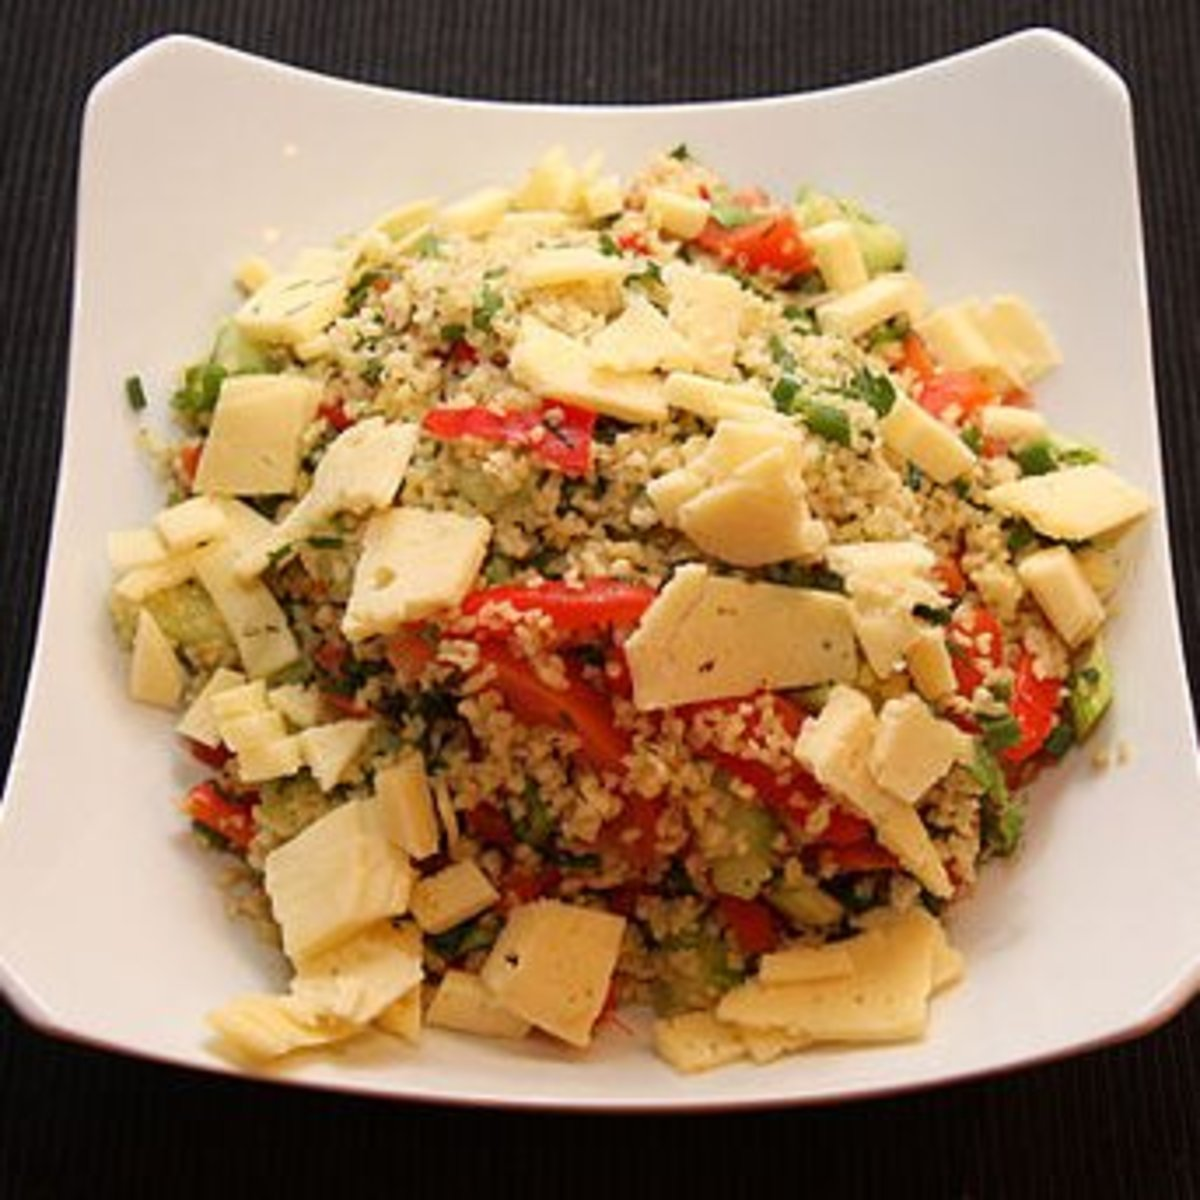 Bulgur Wheat Salad - Delicious!